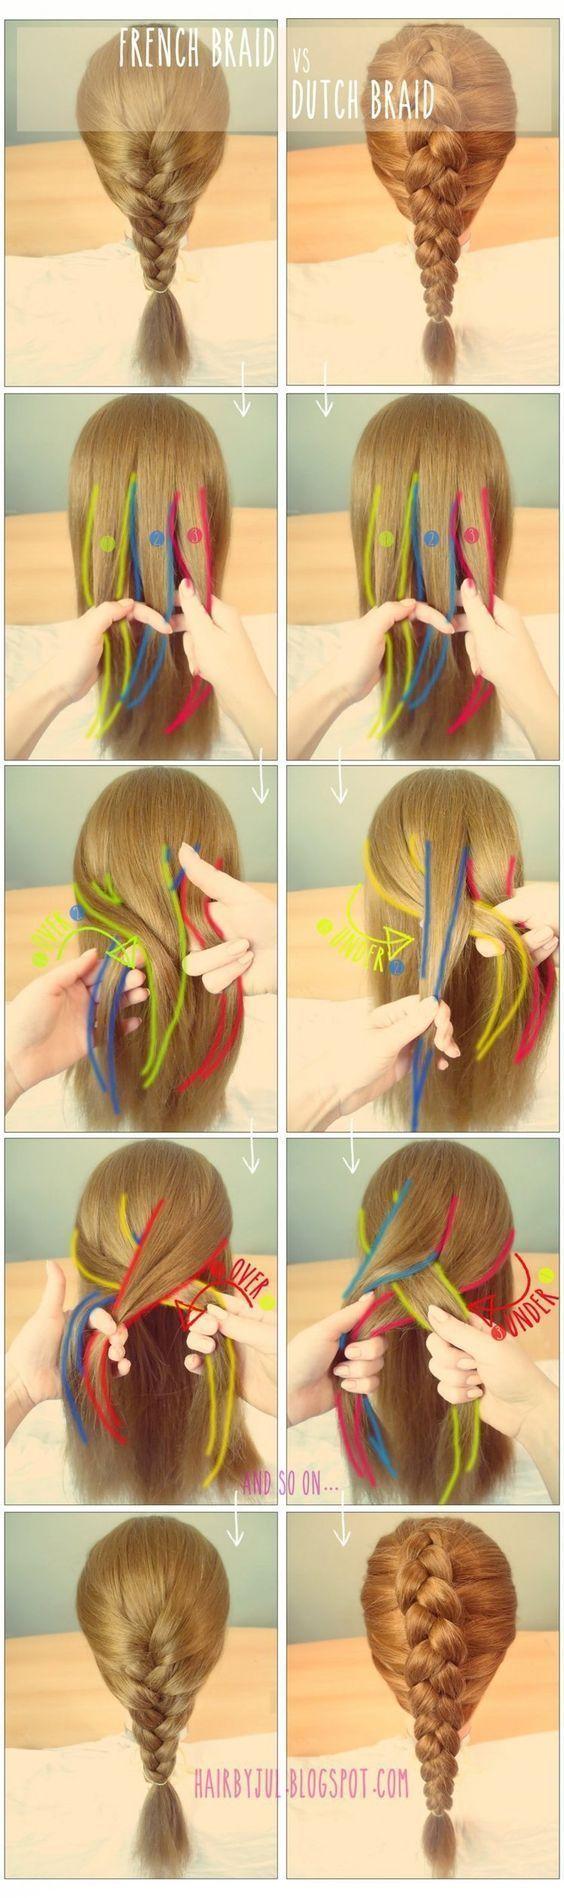 Easy Braids Прически in Pinterest Braids Hair styles